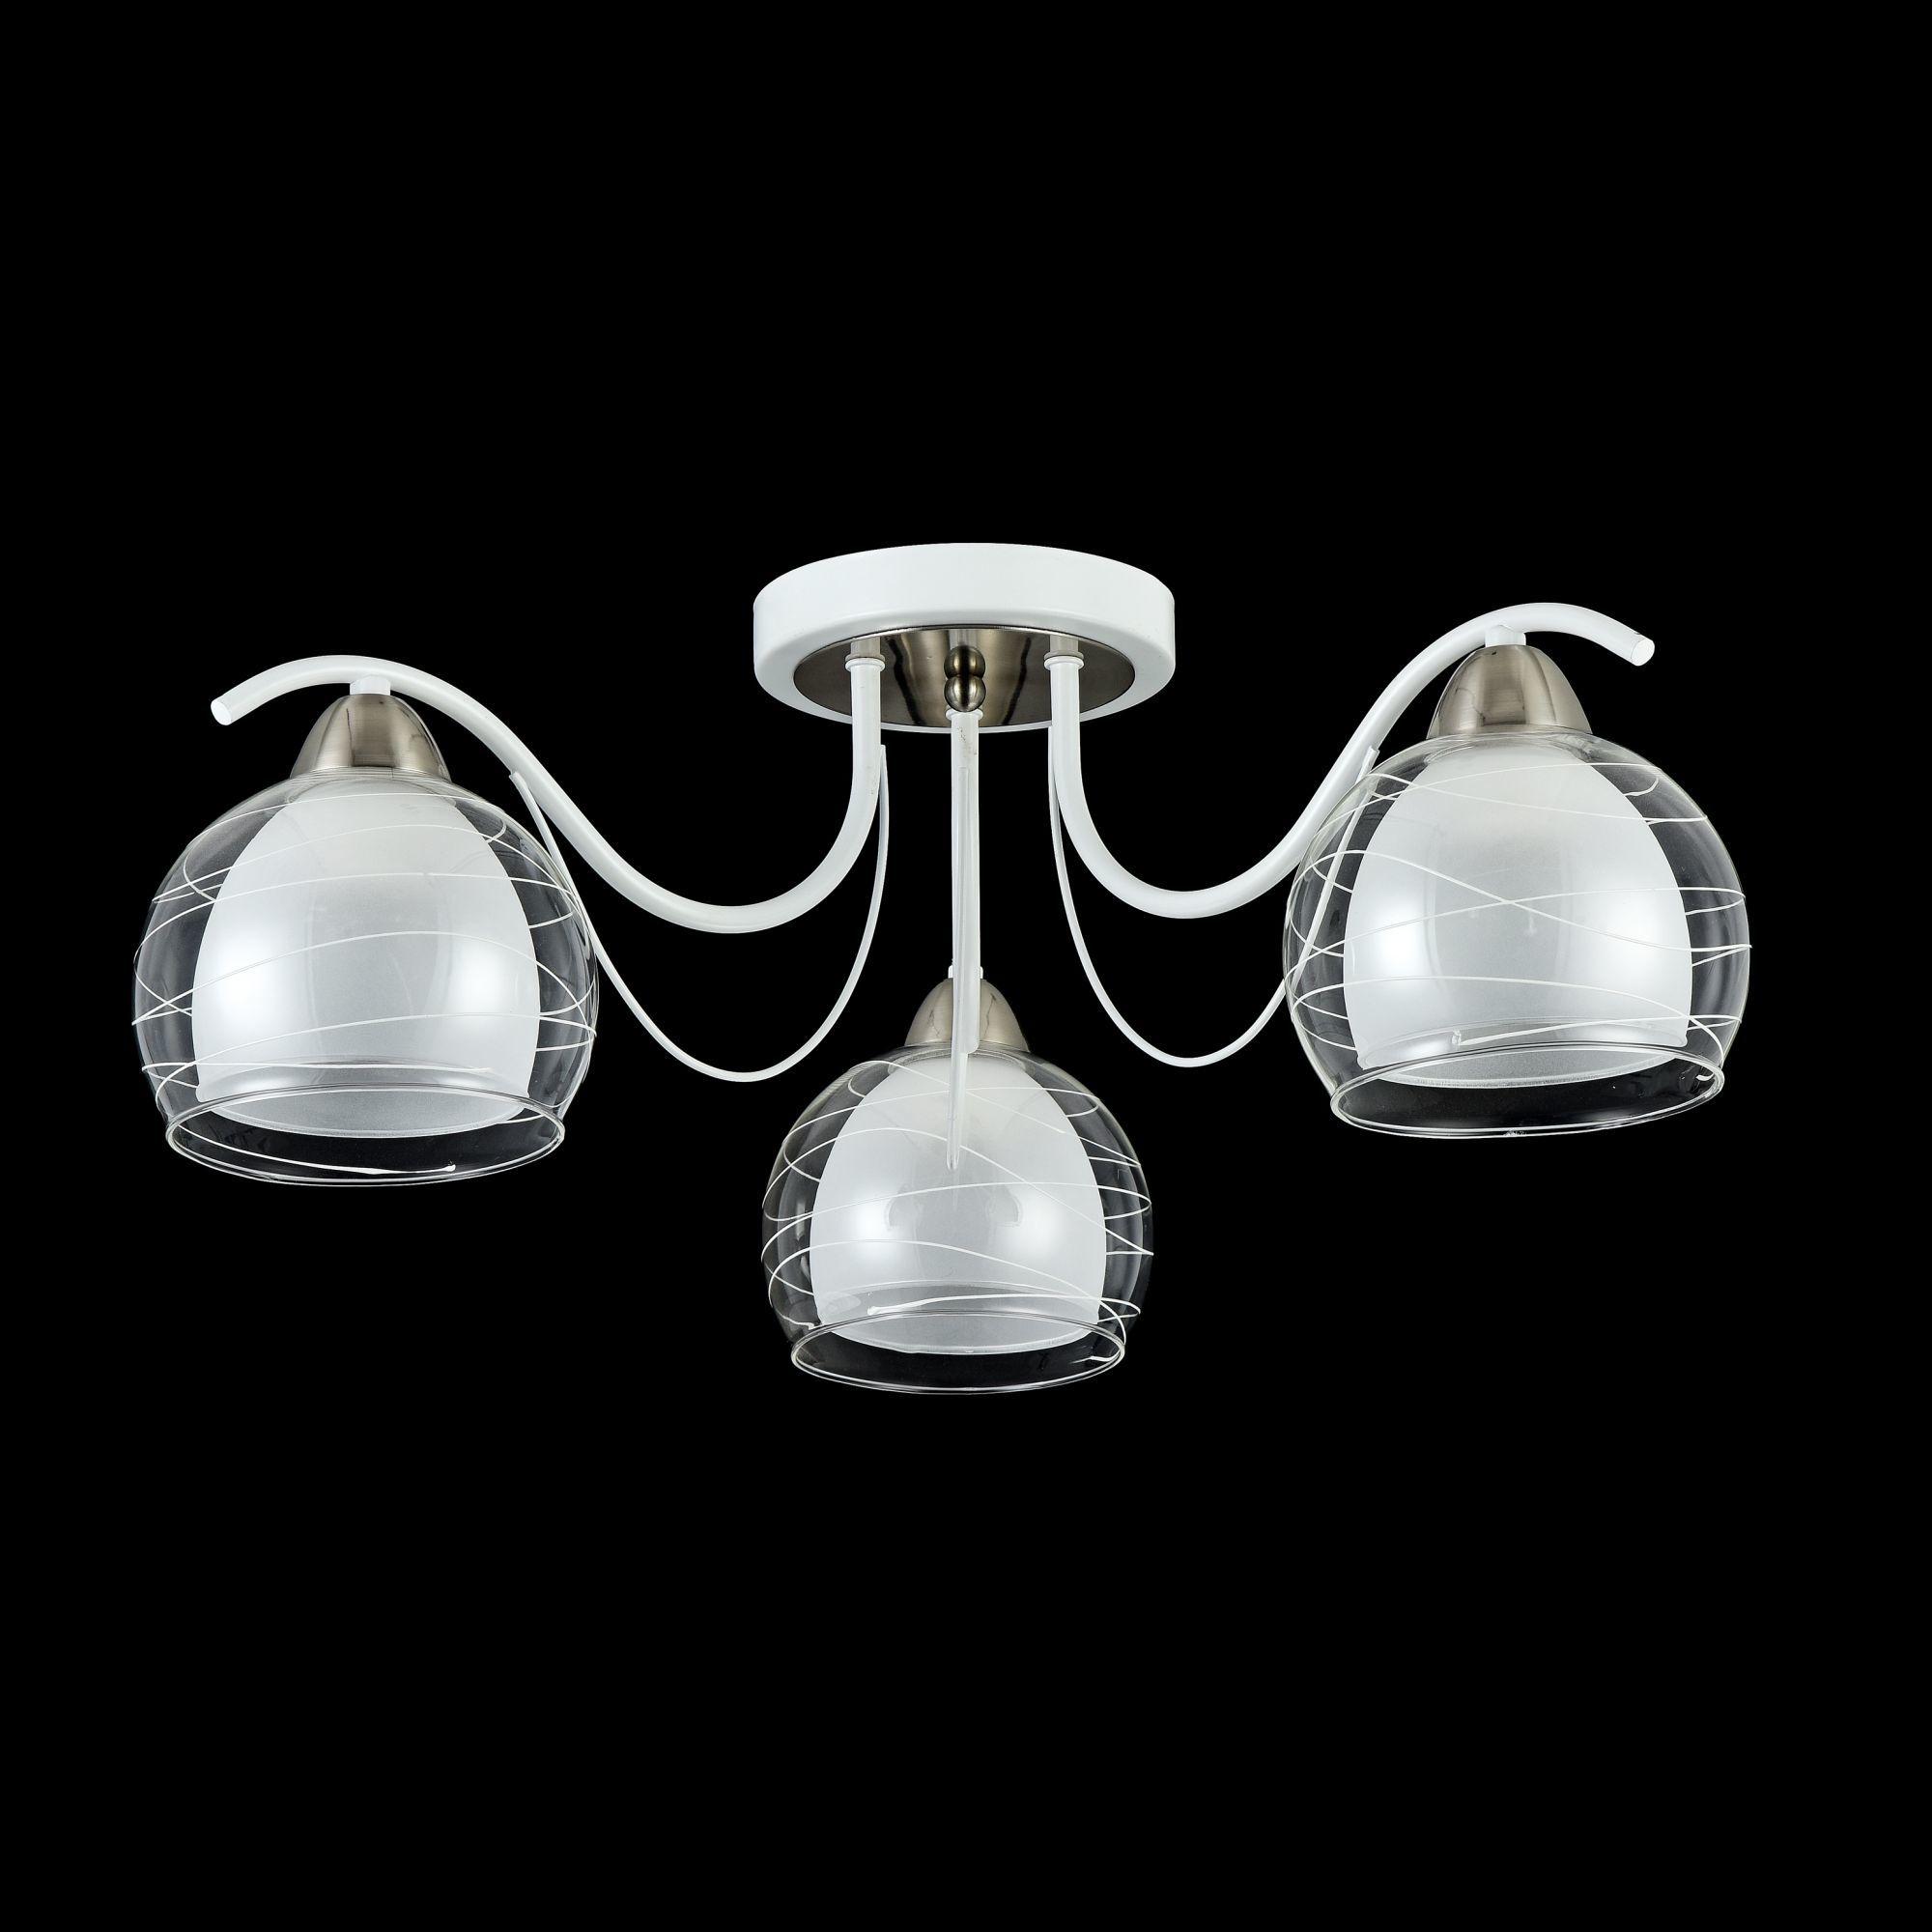 Потолочная люстра Freya Nikki FR5052-CL-03-W, 3xE14x60W, белый с никелем, белый с прозрачным, прозрачный с белым, металл, стекло - фото 3